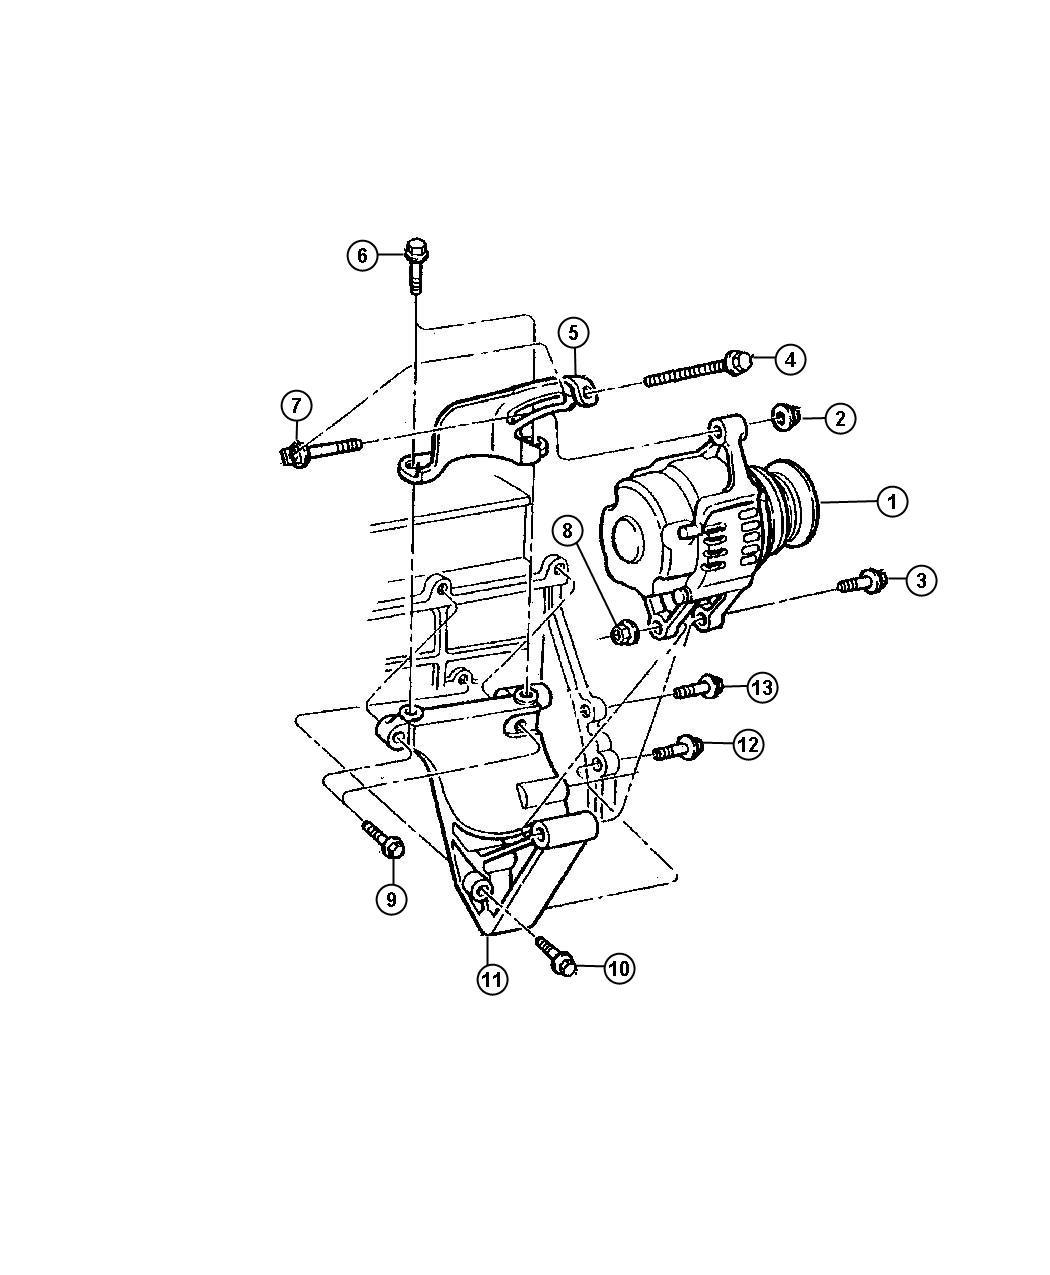 Service Manual 1996 Dodge Bolts Alternator Support